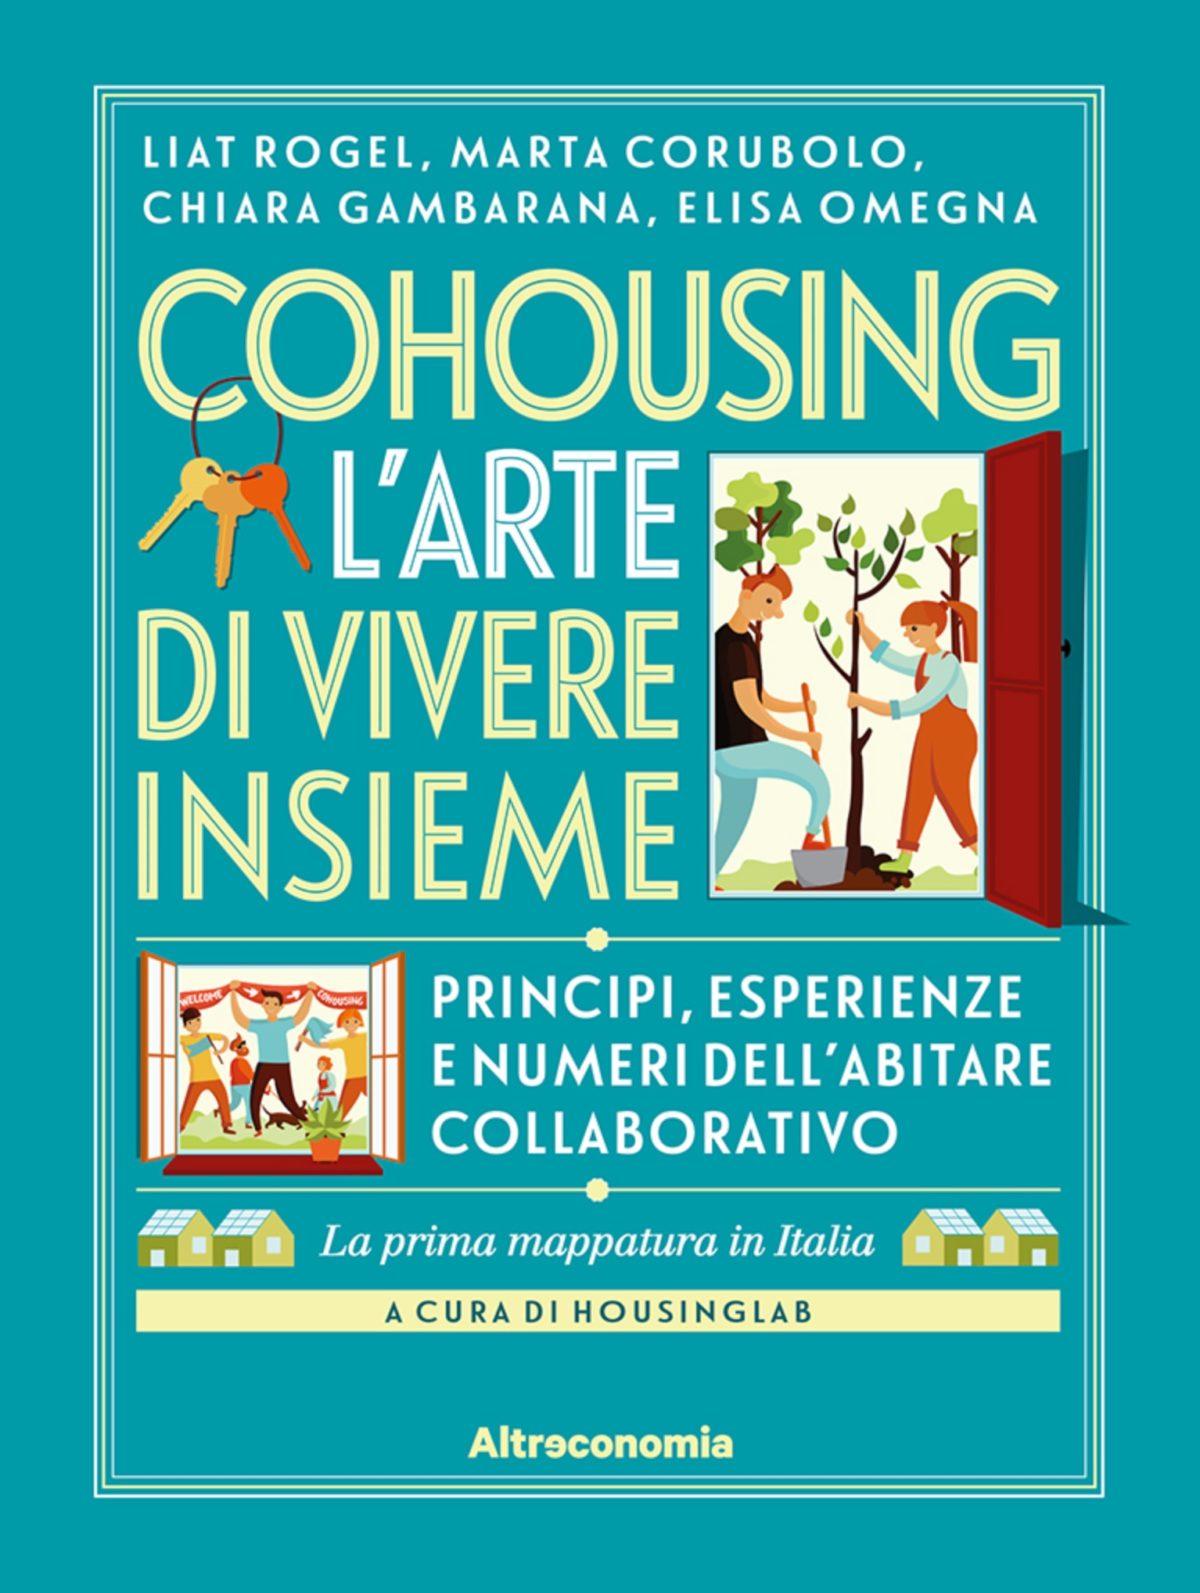 30 cohousingprojekt i Italien!